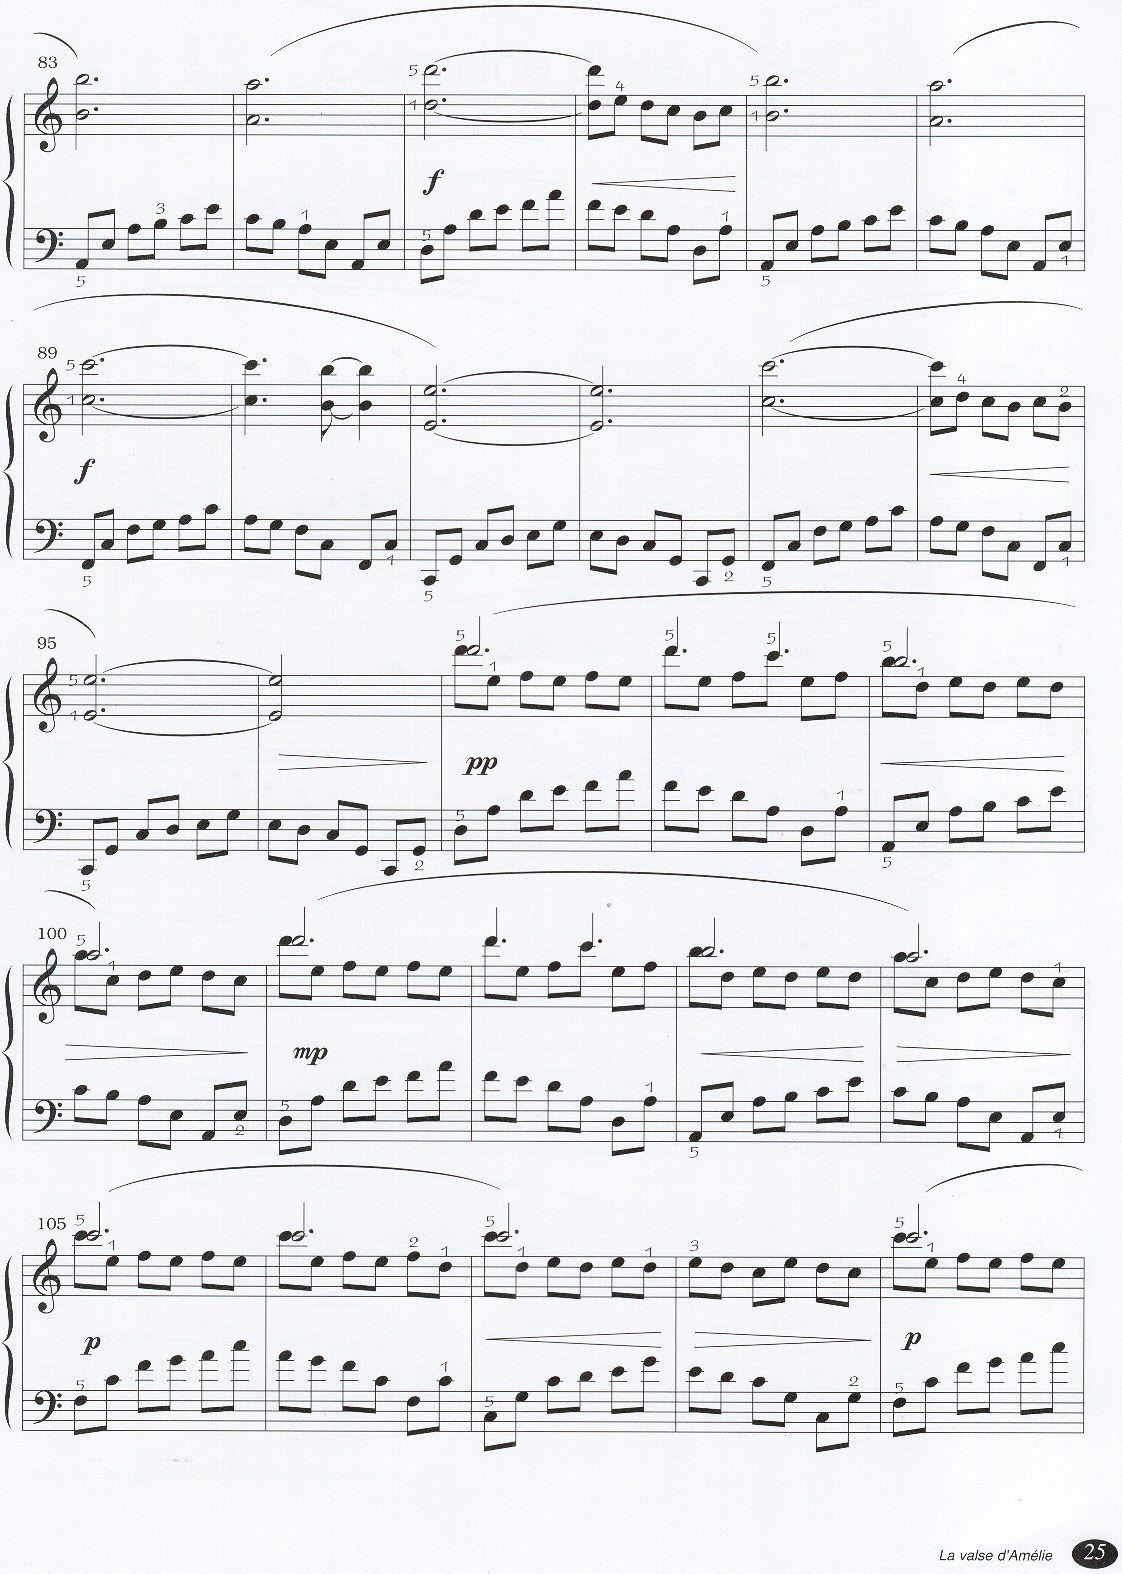 Yann tiersen La Valse dAmelie4 - نت آهنگ La Valse d'Amélie از Yann tiersen